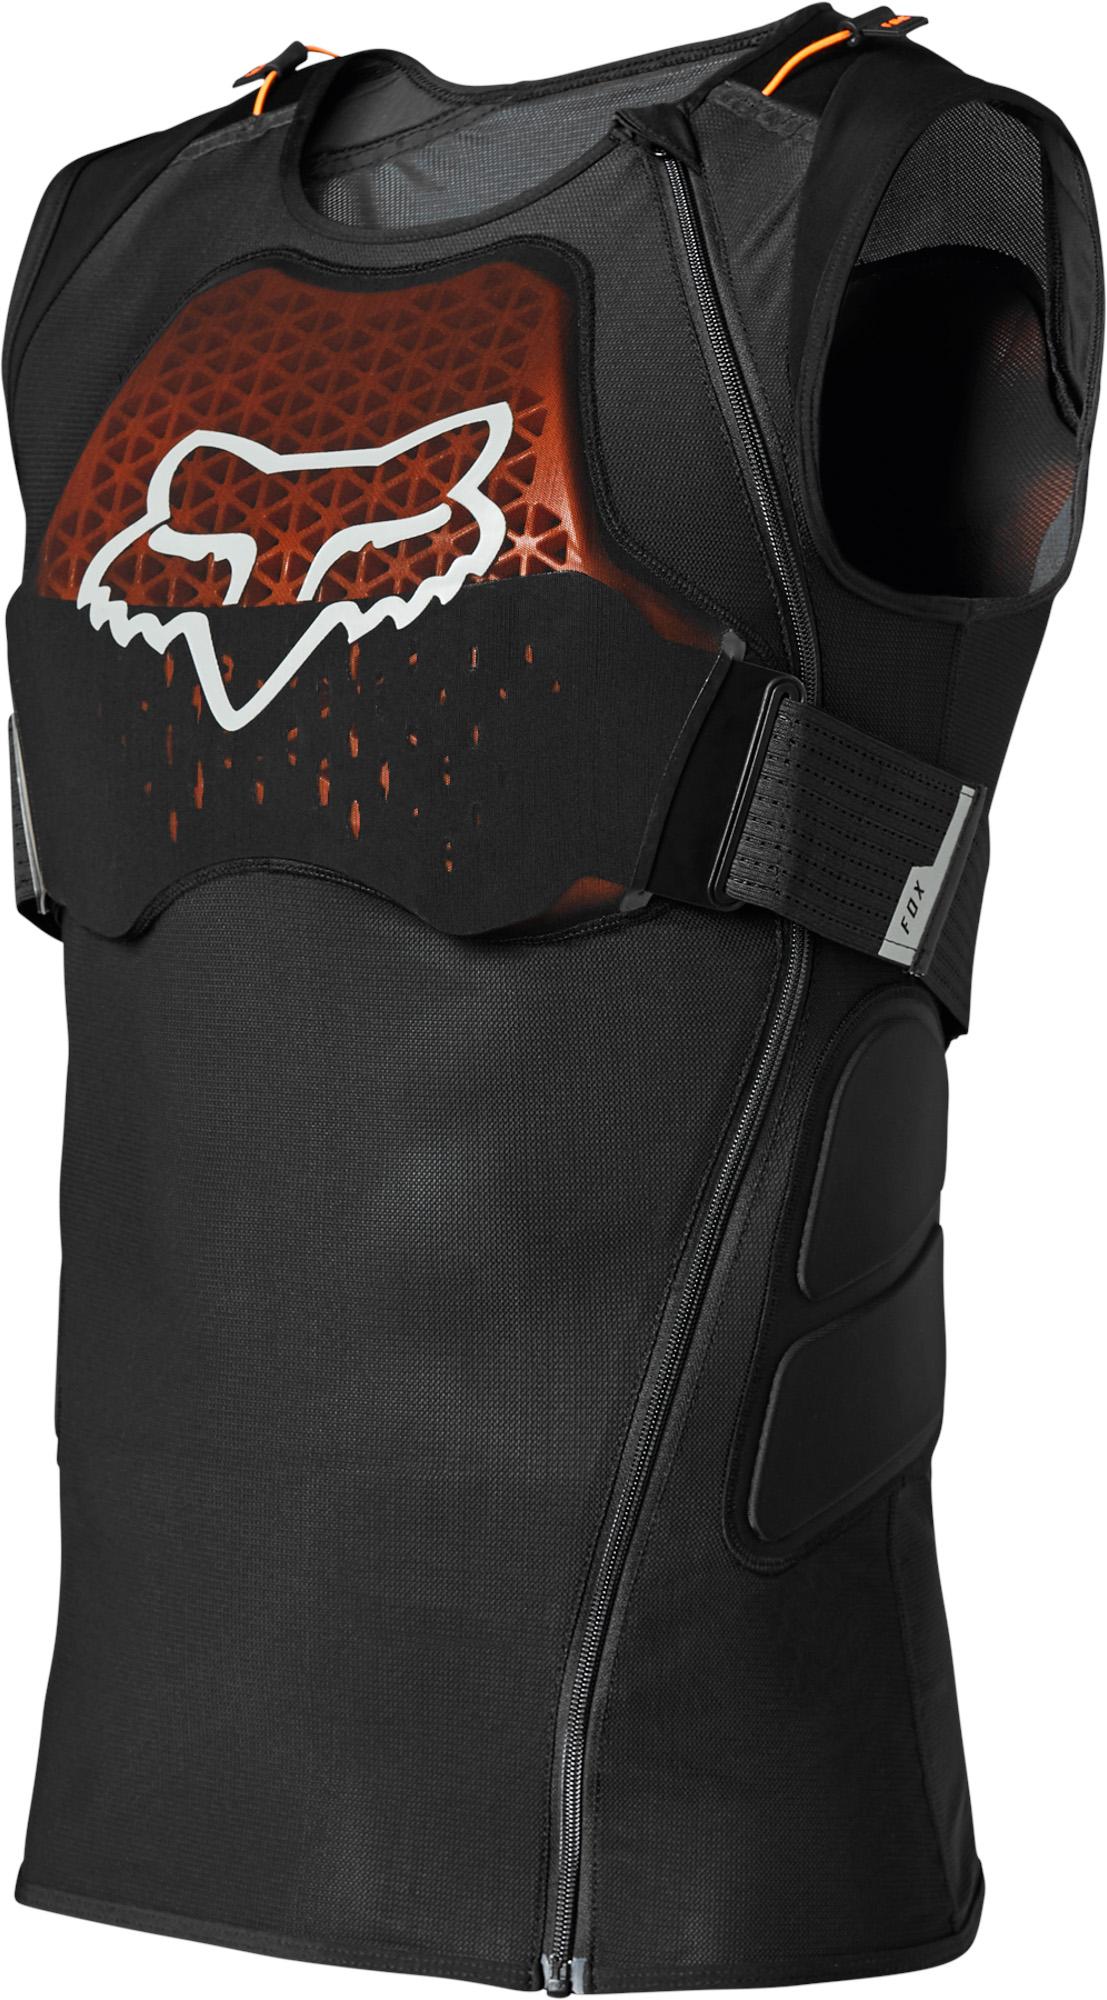 FOX Baseframe Pro D3O Vest - Black MX22